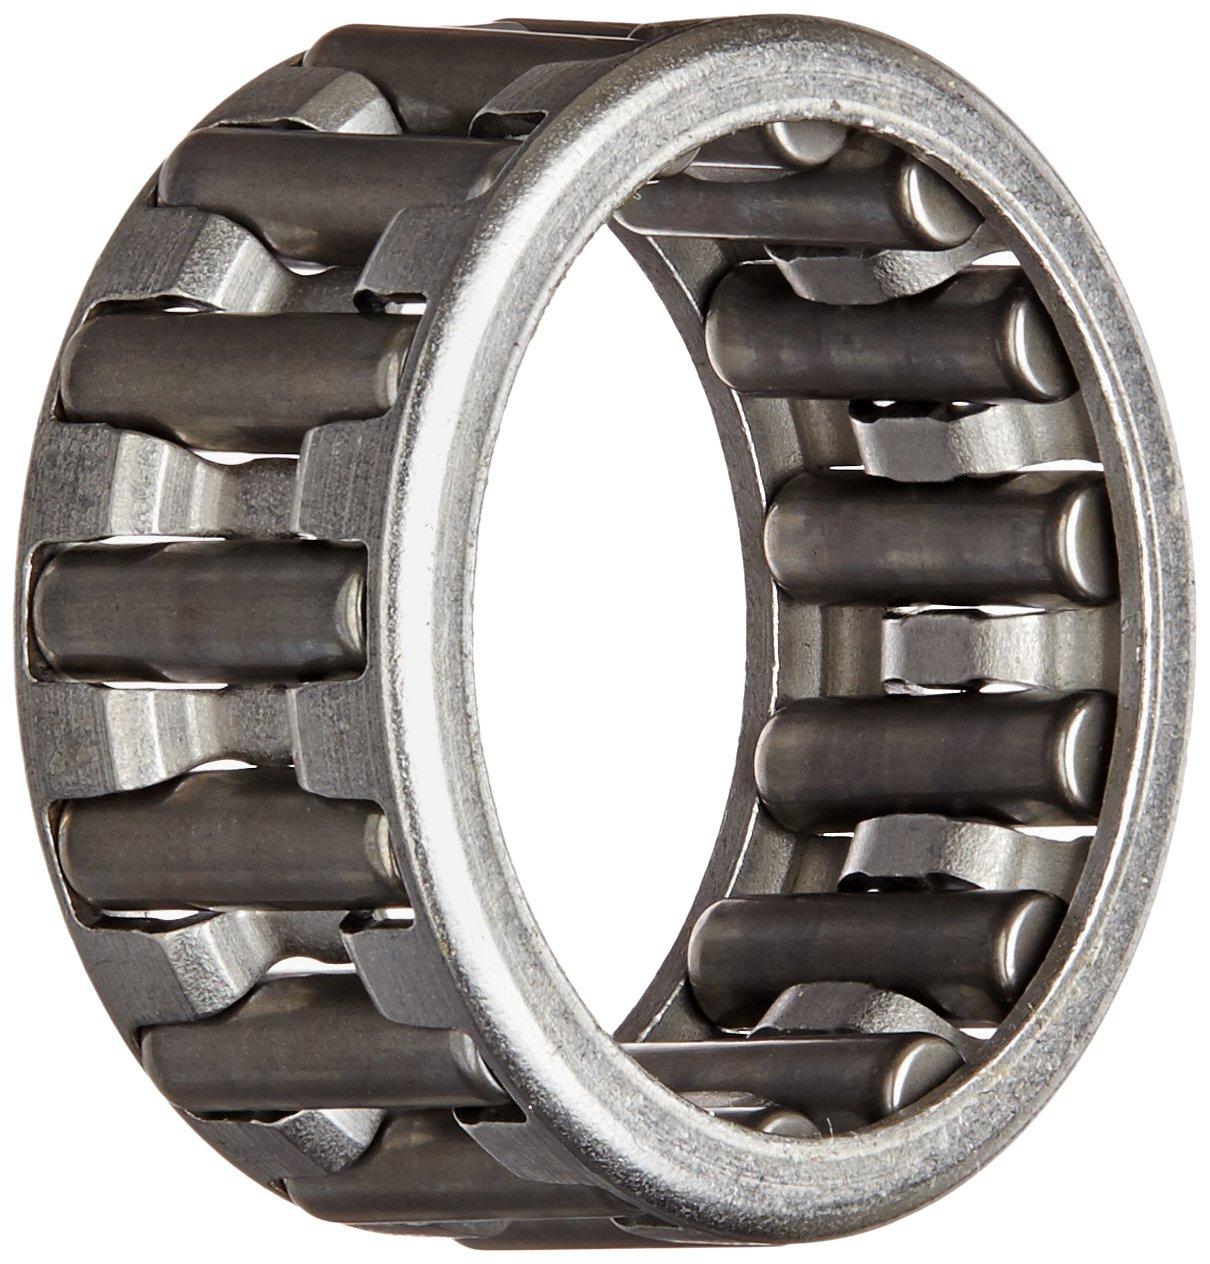 Koyo K20X26X12 Needle Roller Bearing and Roller, Open, Steel Cage, Metric, 20mm ID, 26mm OD, 12mm Width